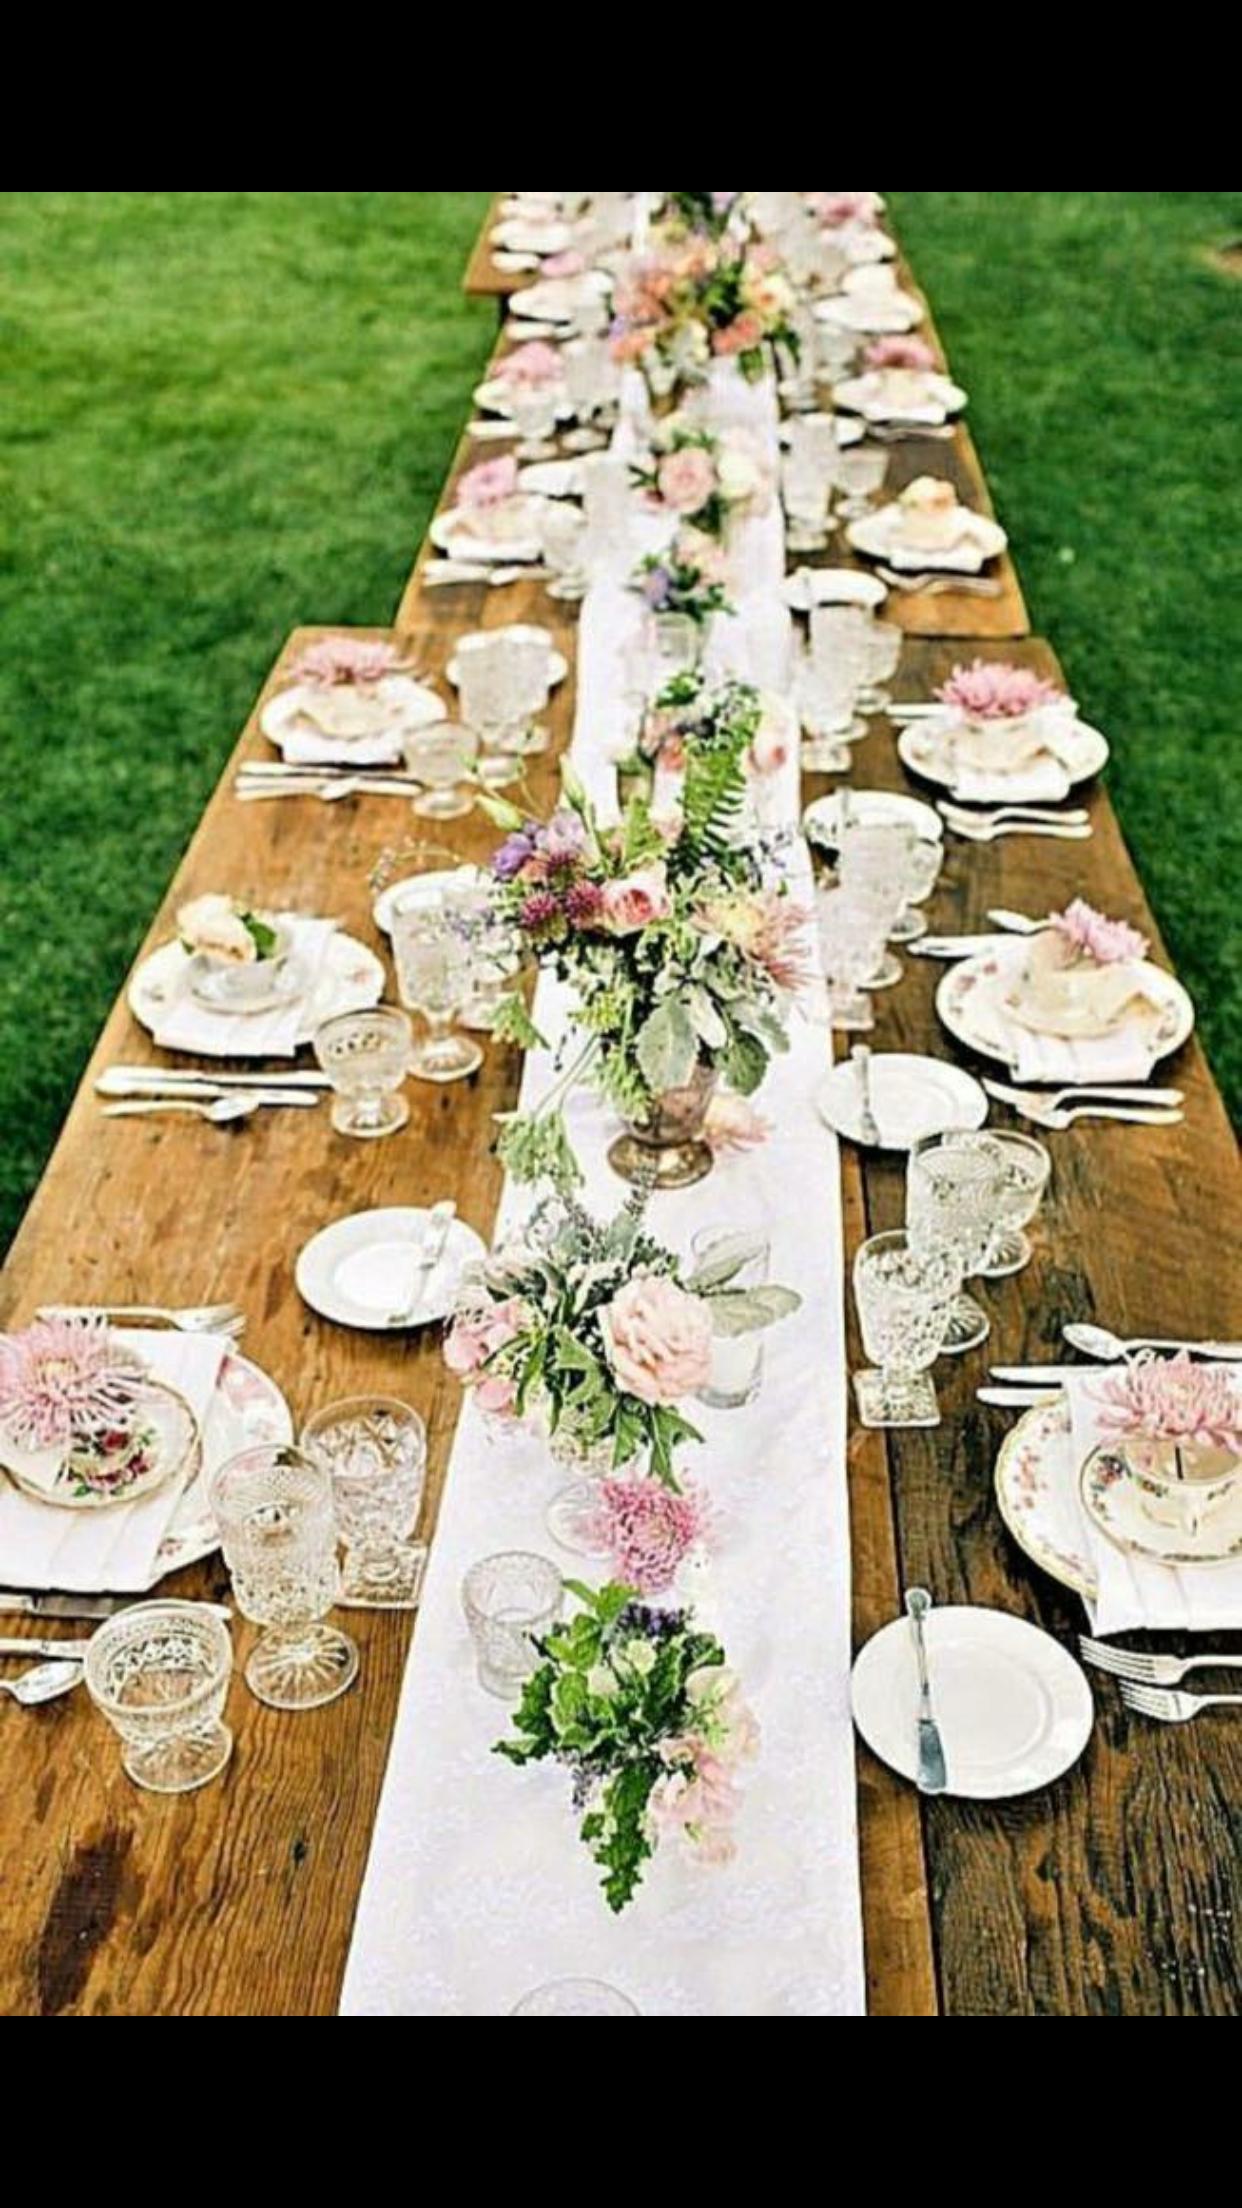 Houston, TX Rustic tea party, Tea party wedding, Tea